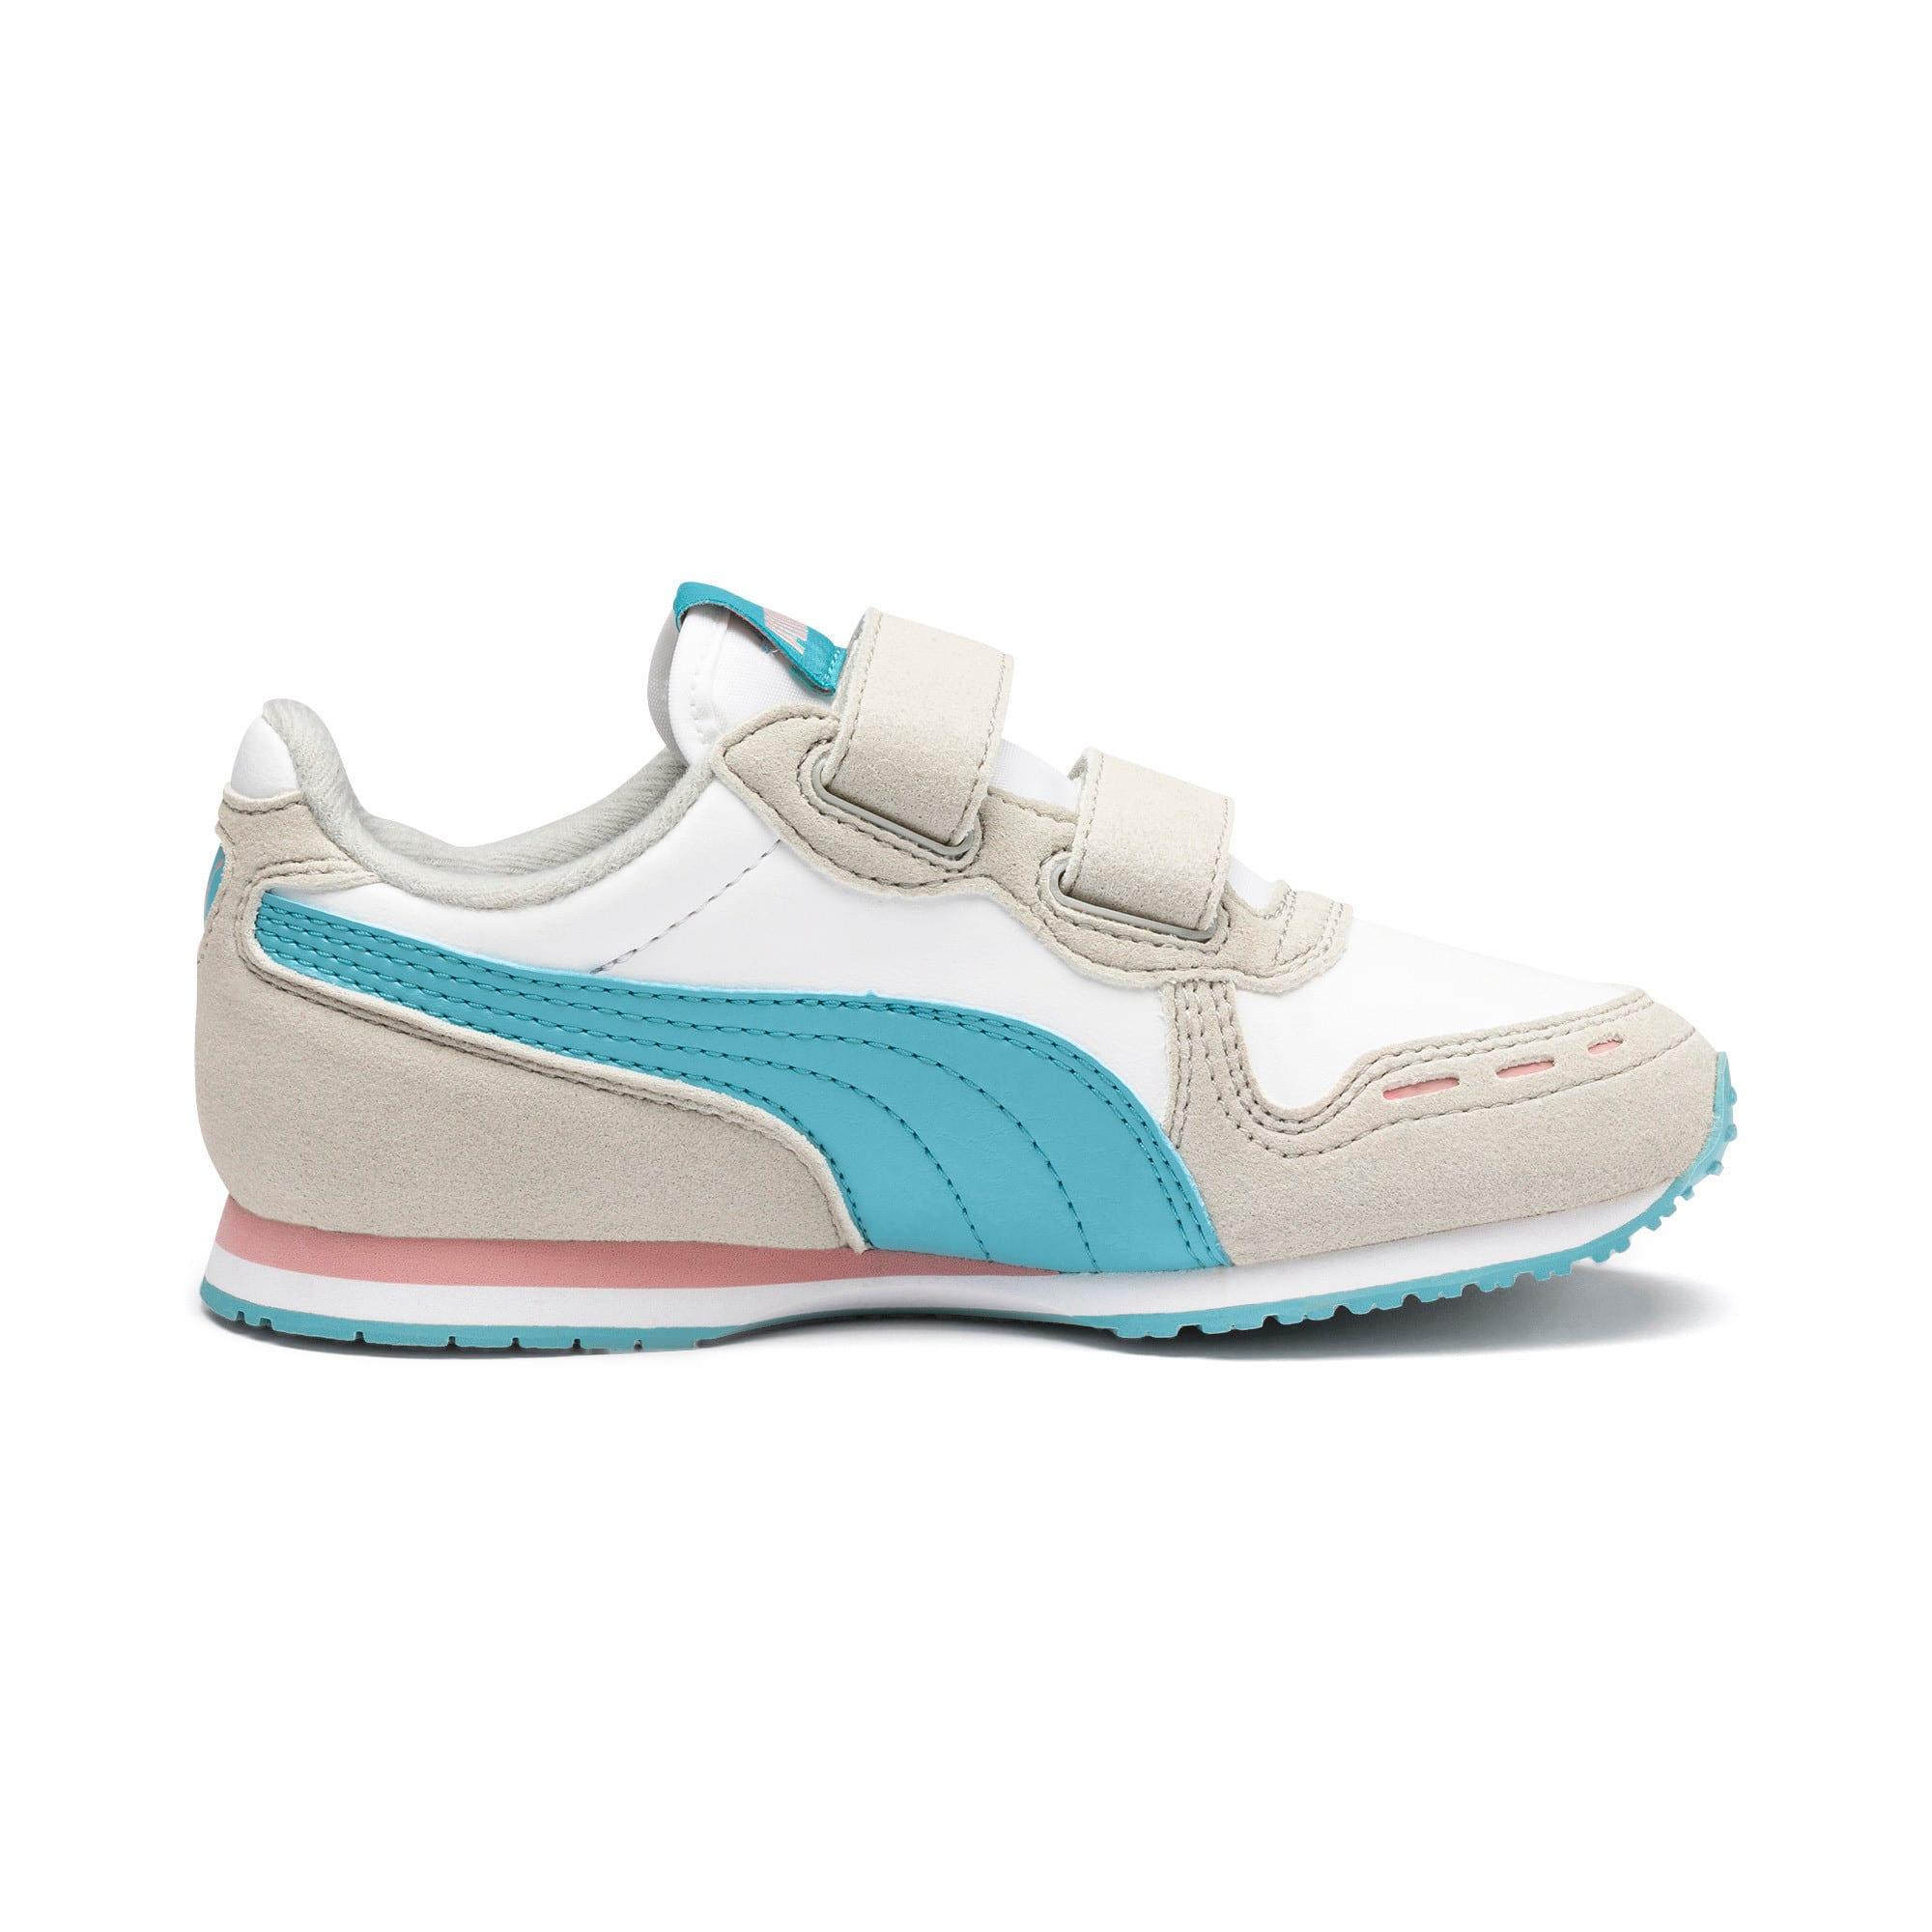 Thumbnail 5 of Cabana Racer SL AC Little Kids' Shoes, Puma White-Milky Blue, medium